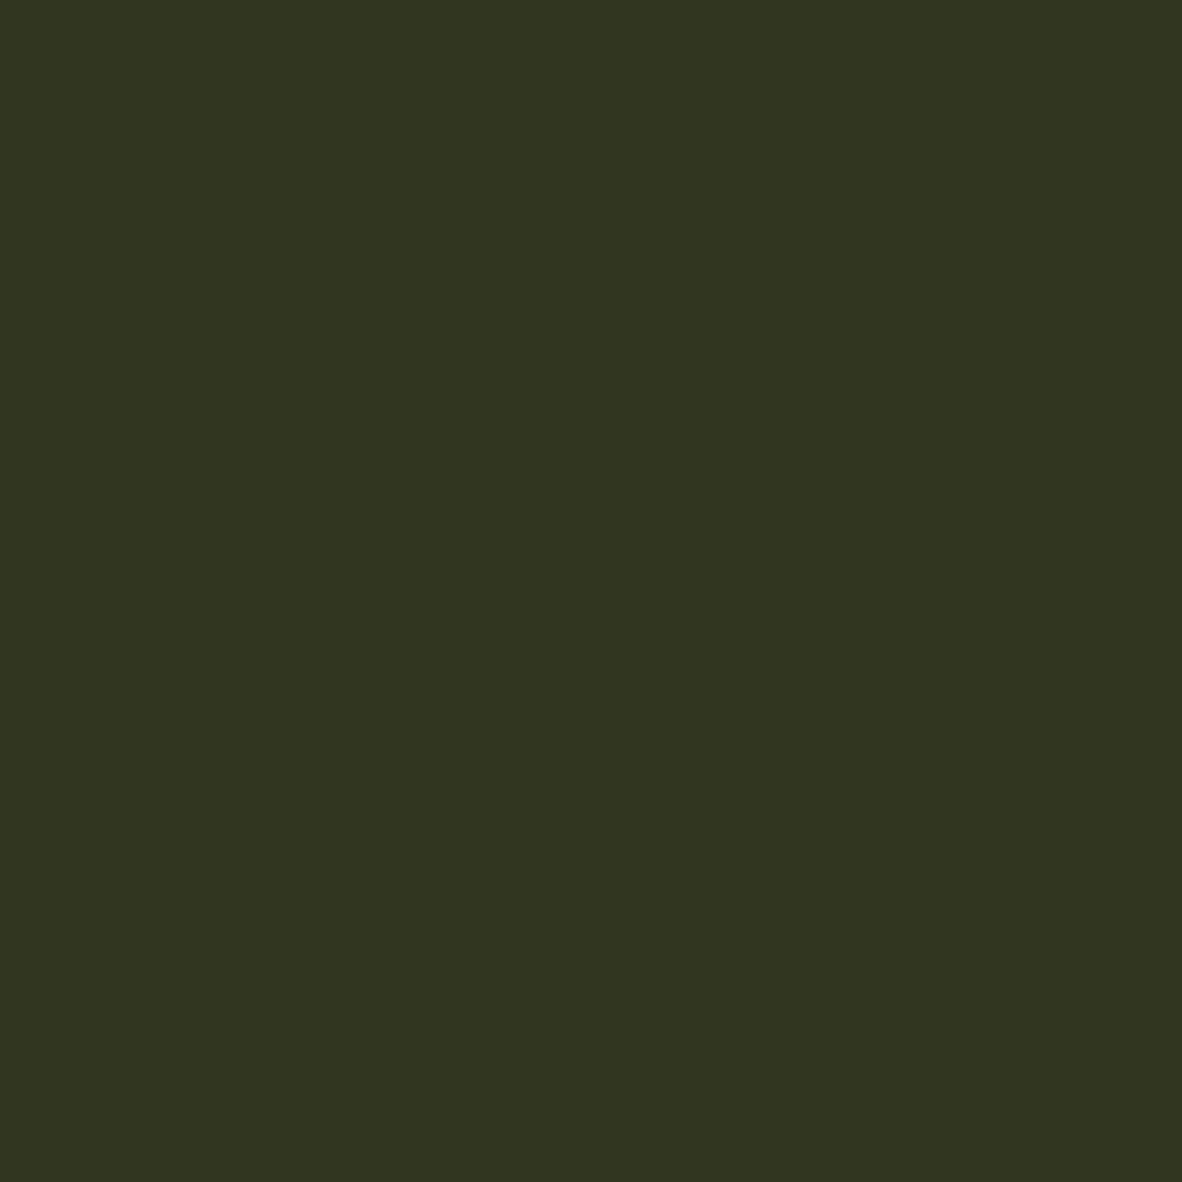 Inktpad donkergroen groot